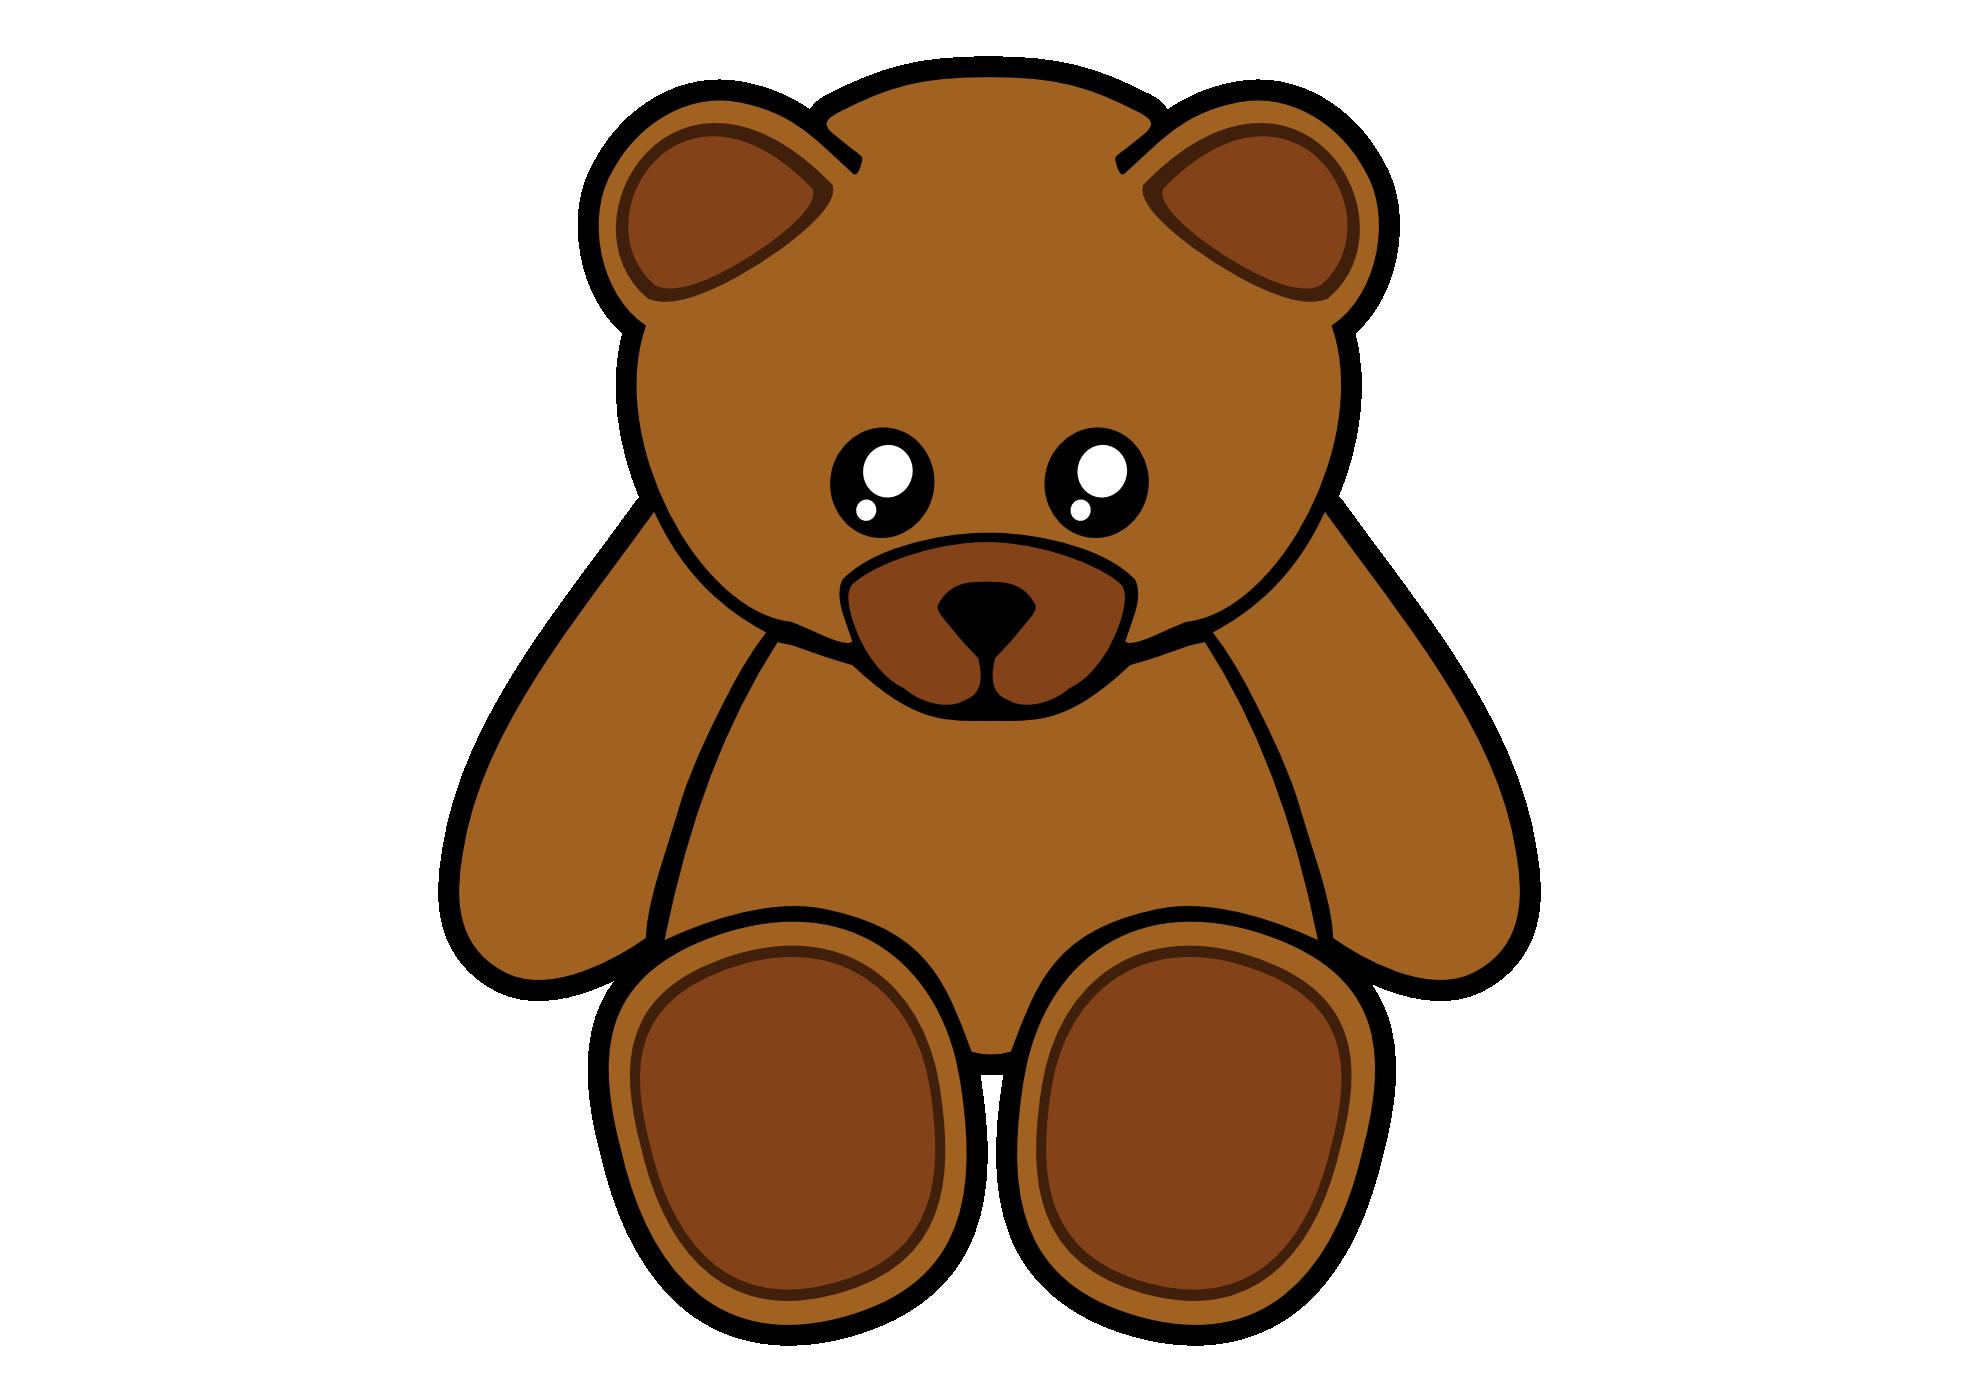 Teddy clipart Teddy Teddy clipart clipart Teddy